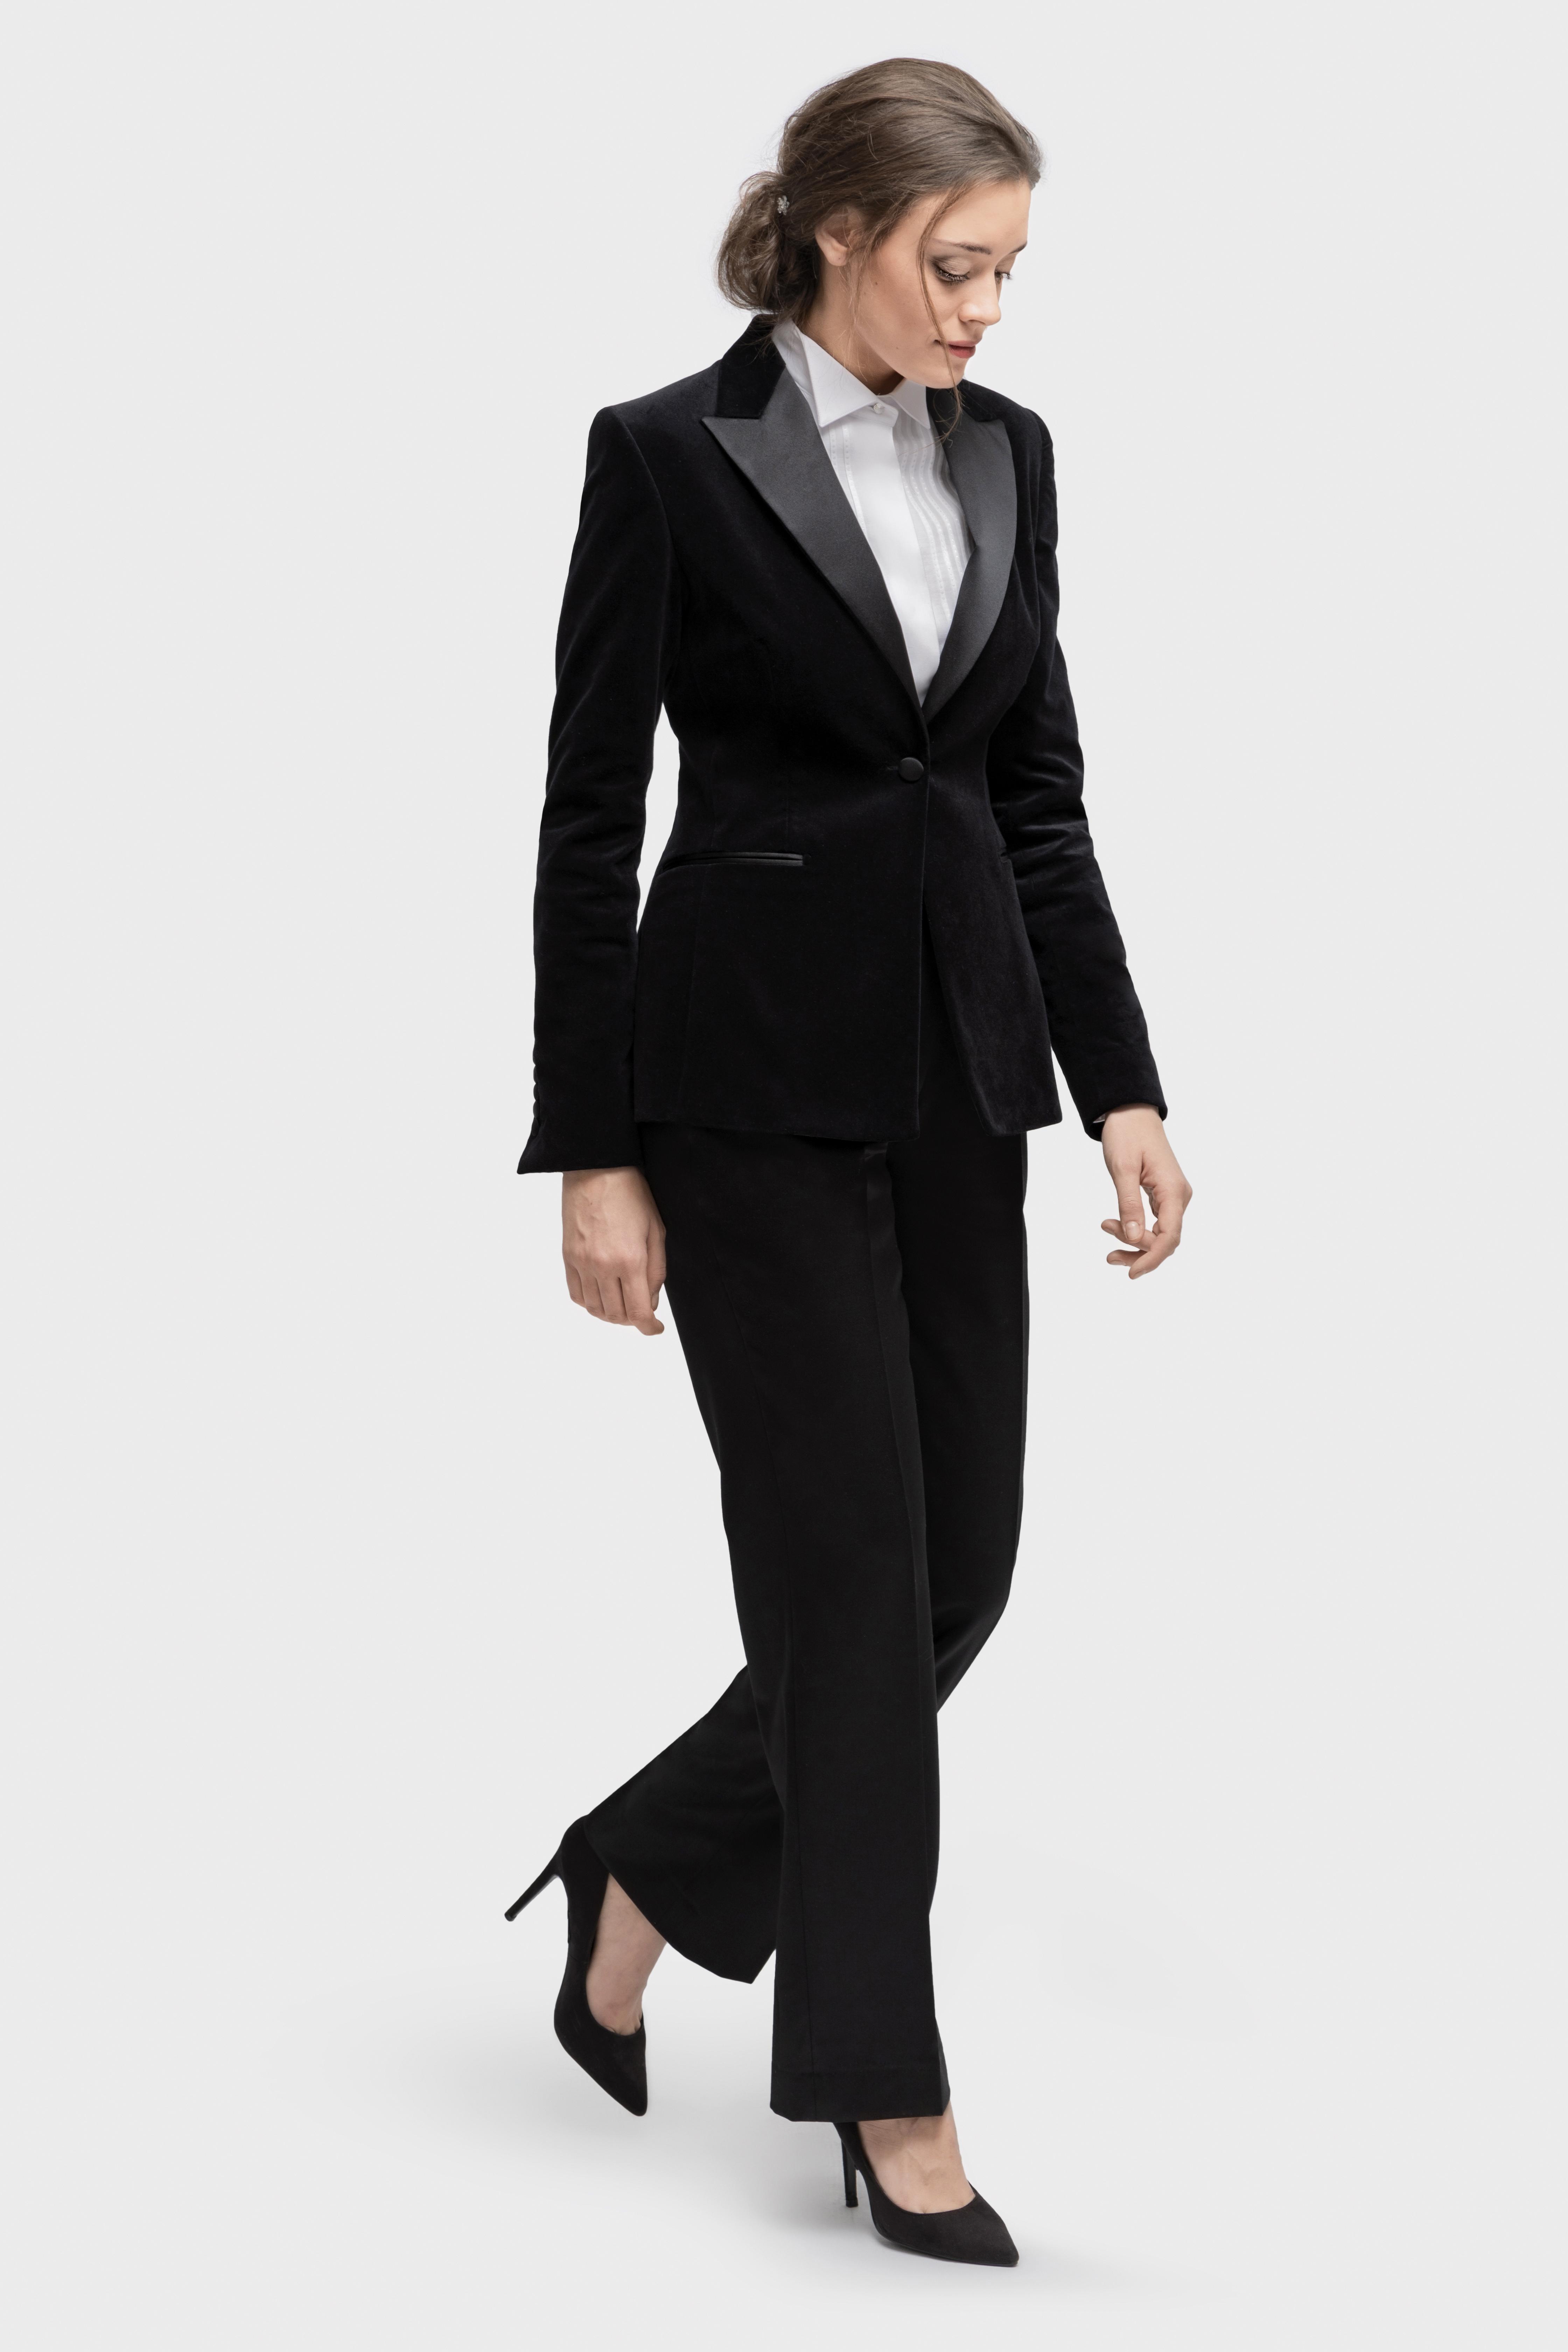 www.richardfox.co ladies Custom Tuxedo and shirt